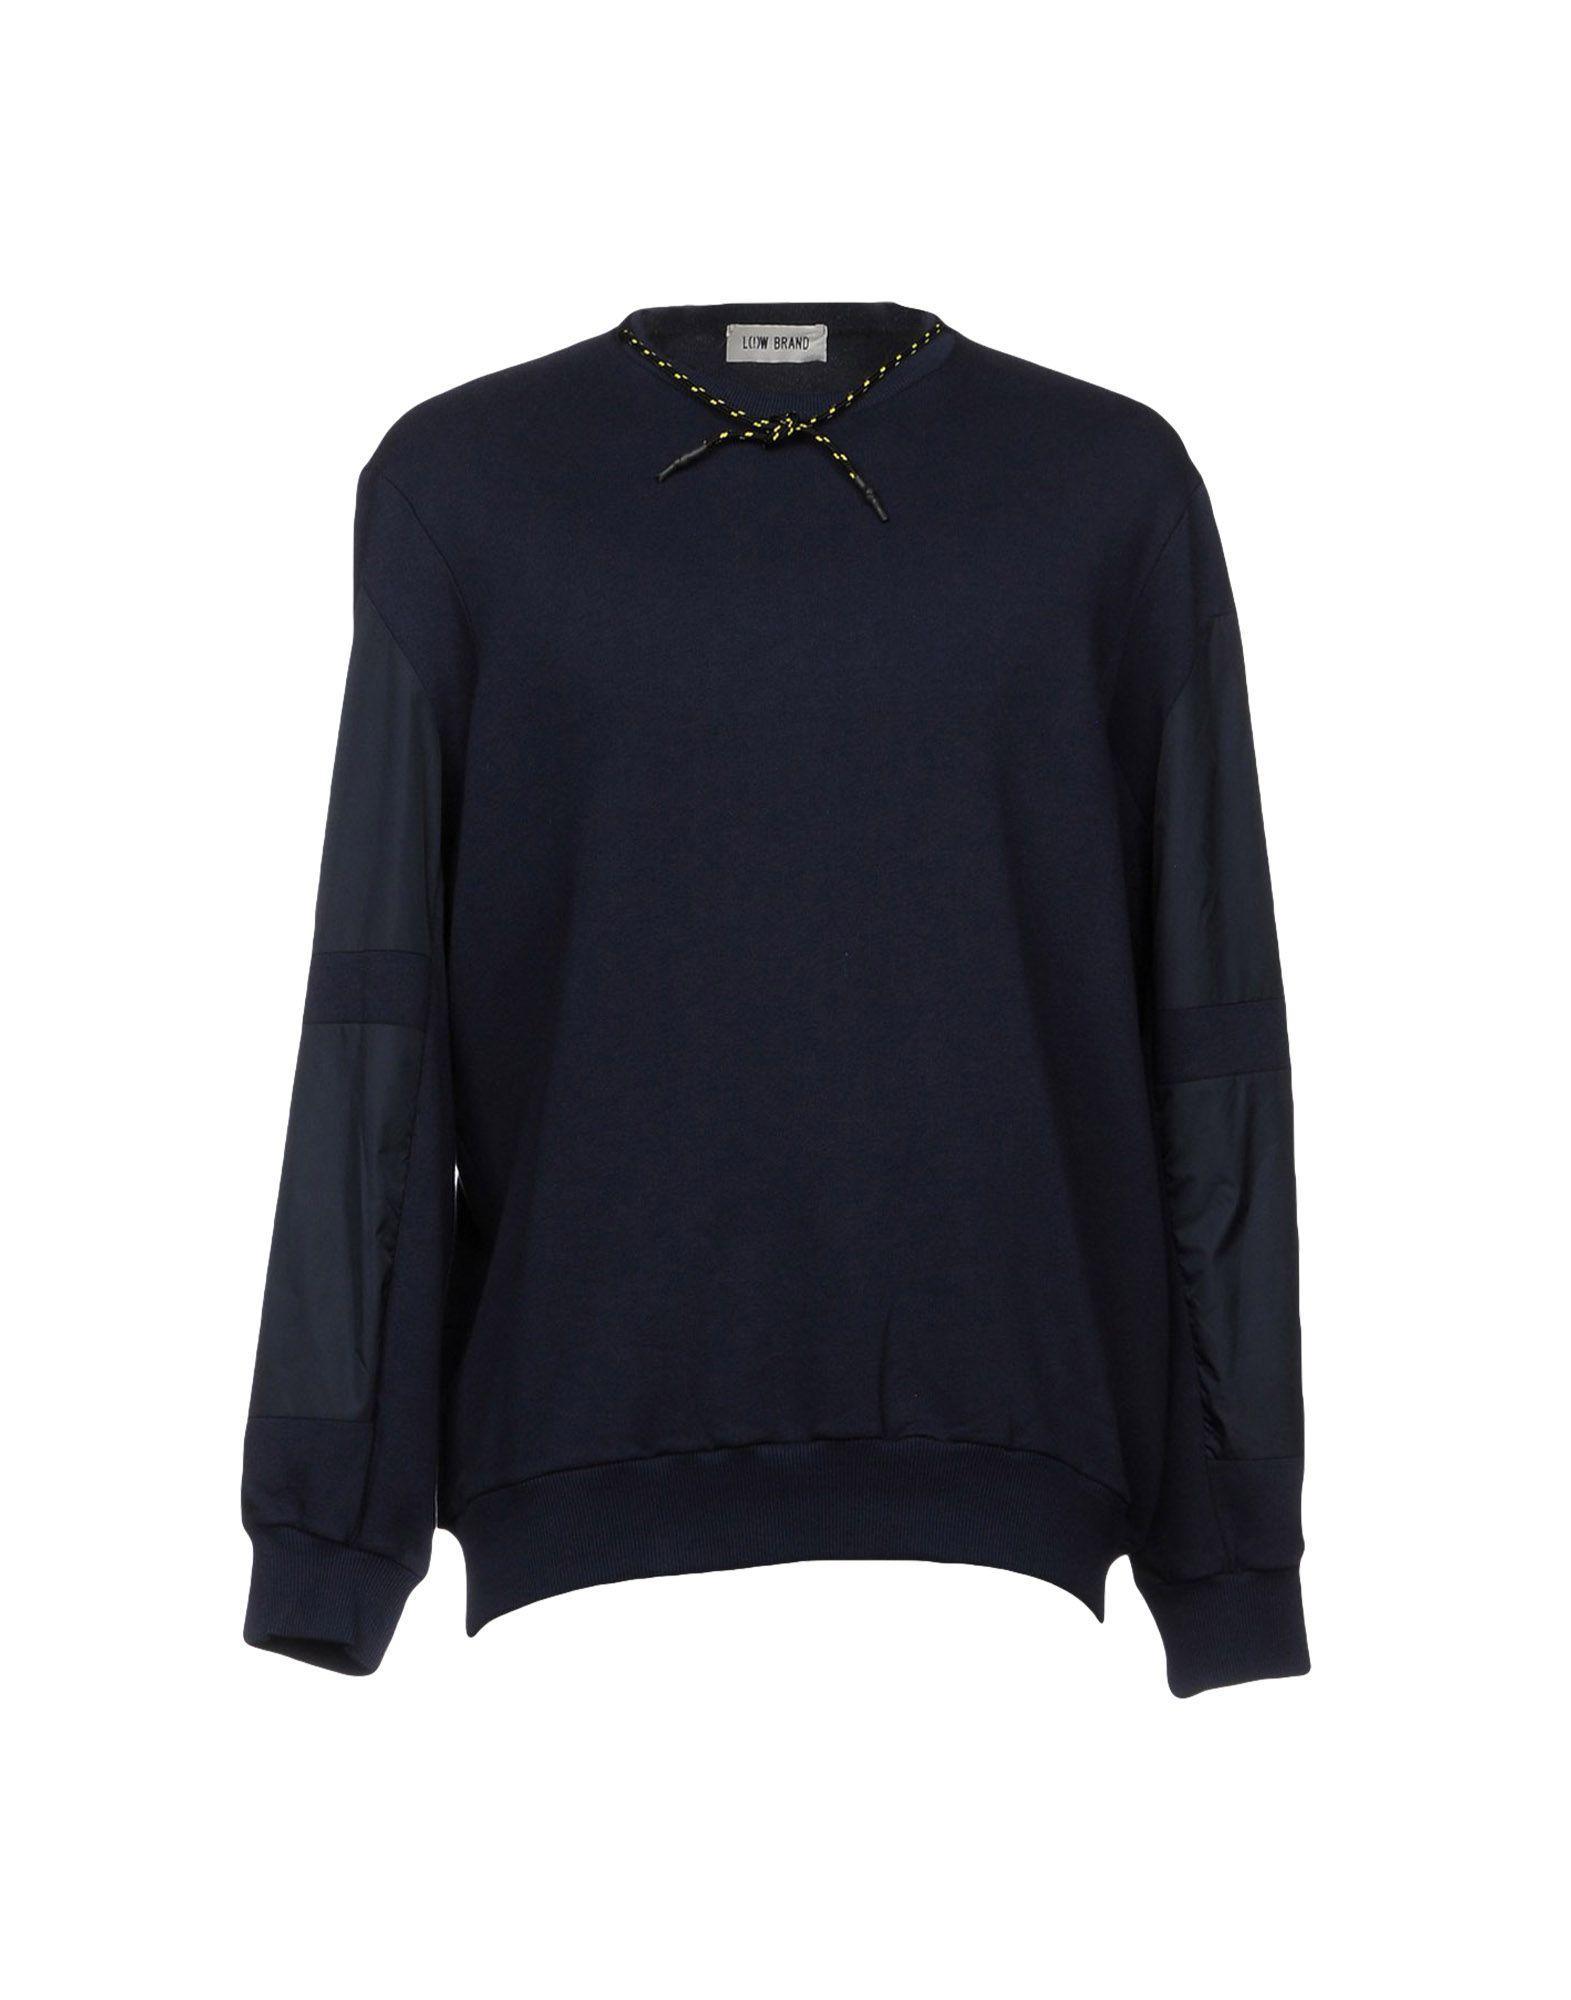 Low Brand Sweatshirt In Dark Blue